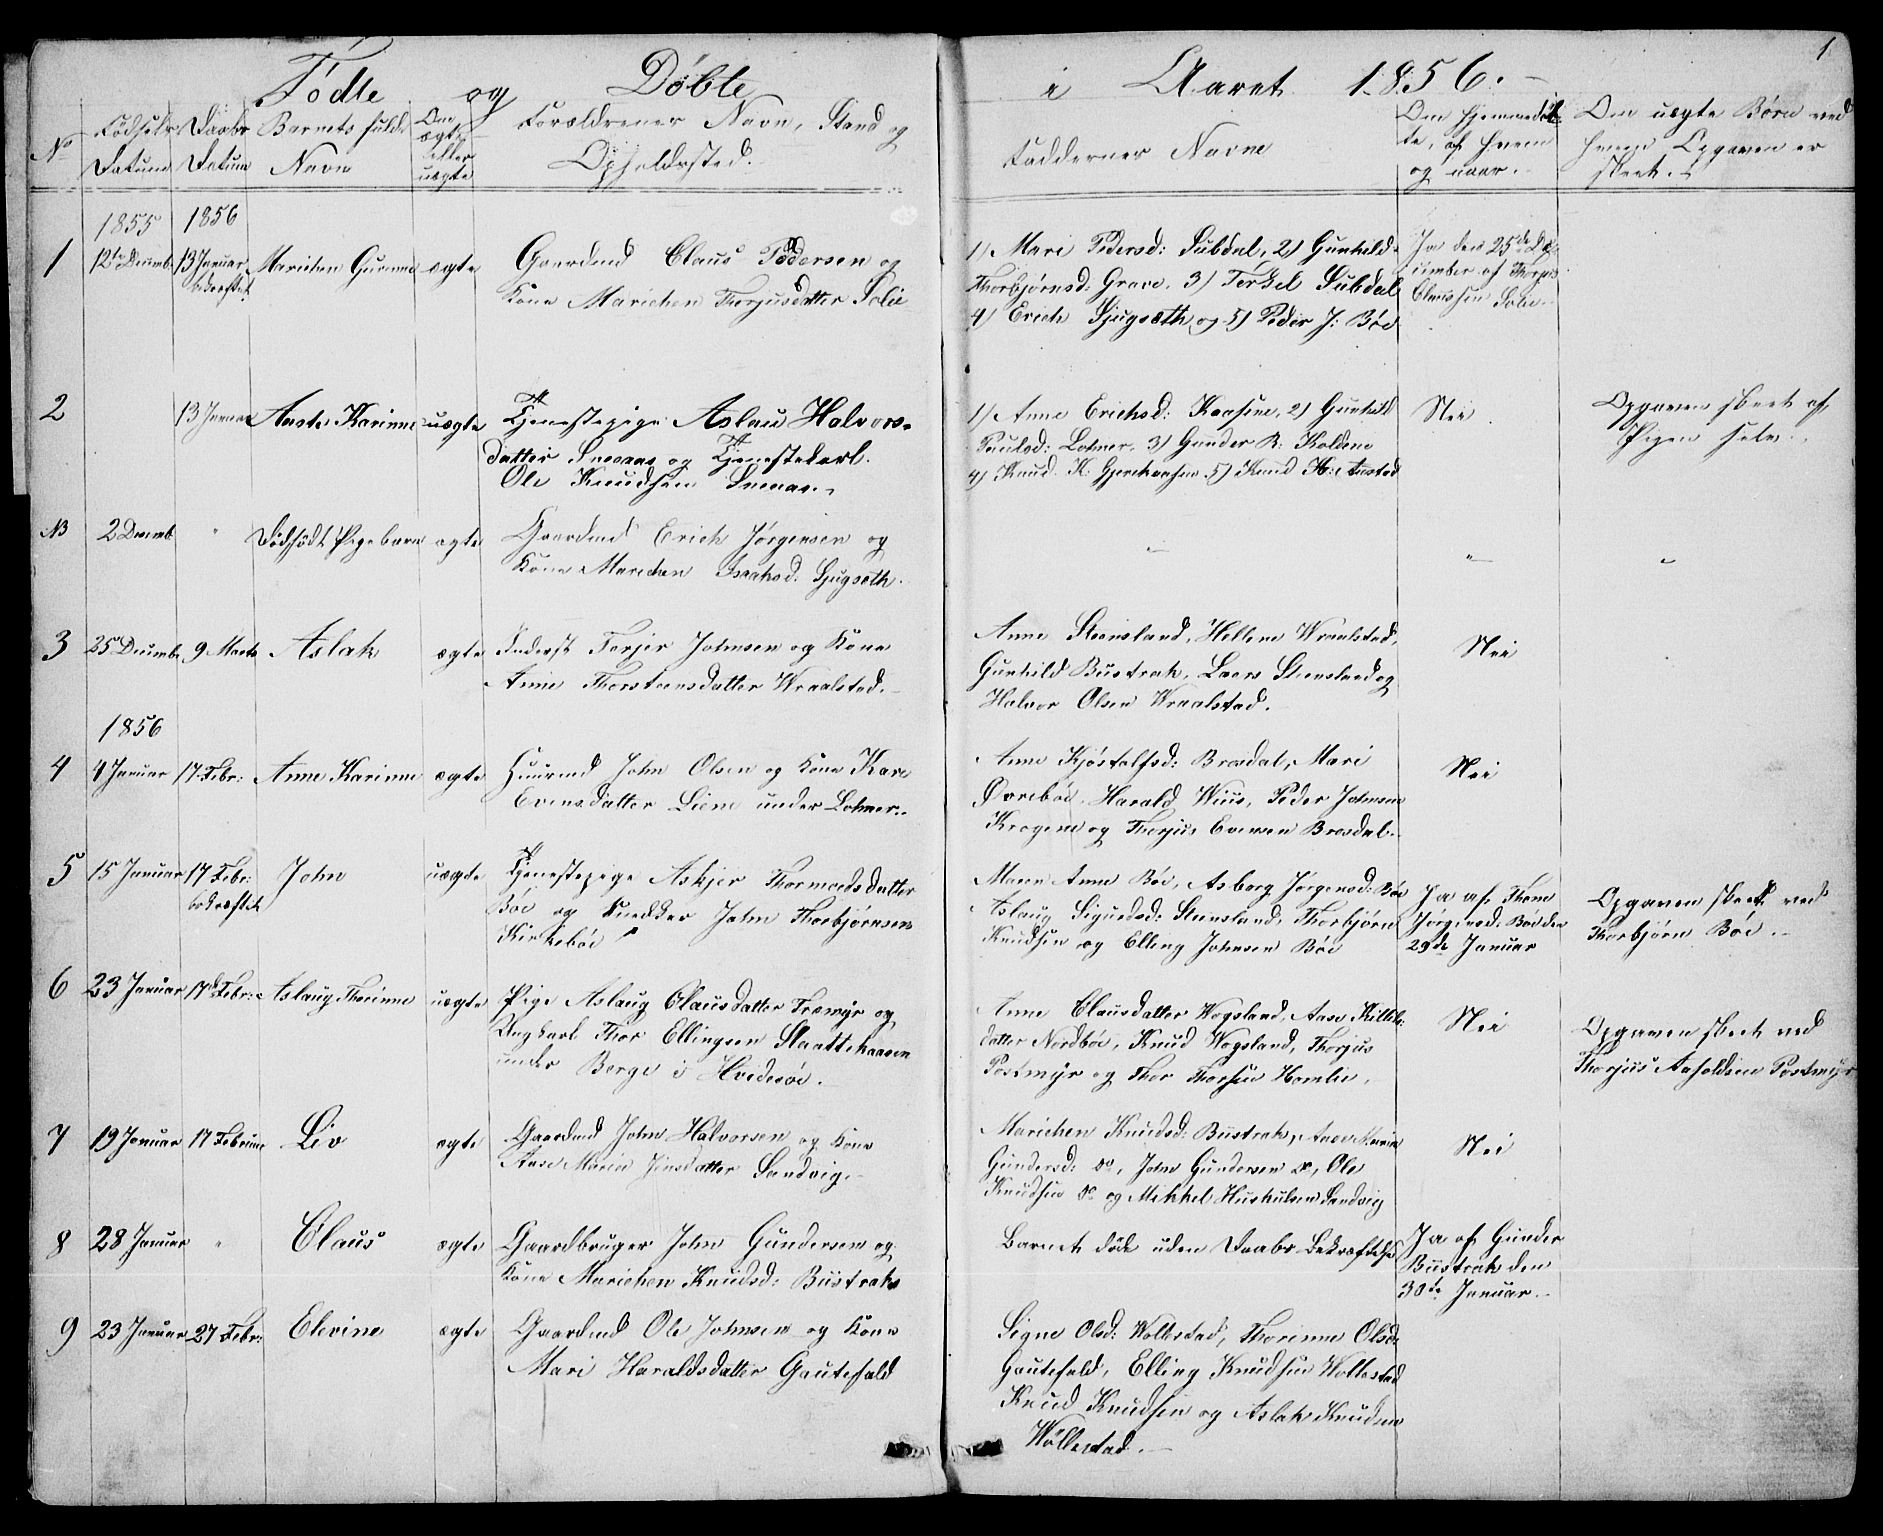 SAKO, Drangedal kirkebøker, G/Gb/L0001: Klokkerbok nr. II 1, 1856-1894, s. 1